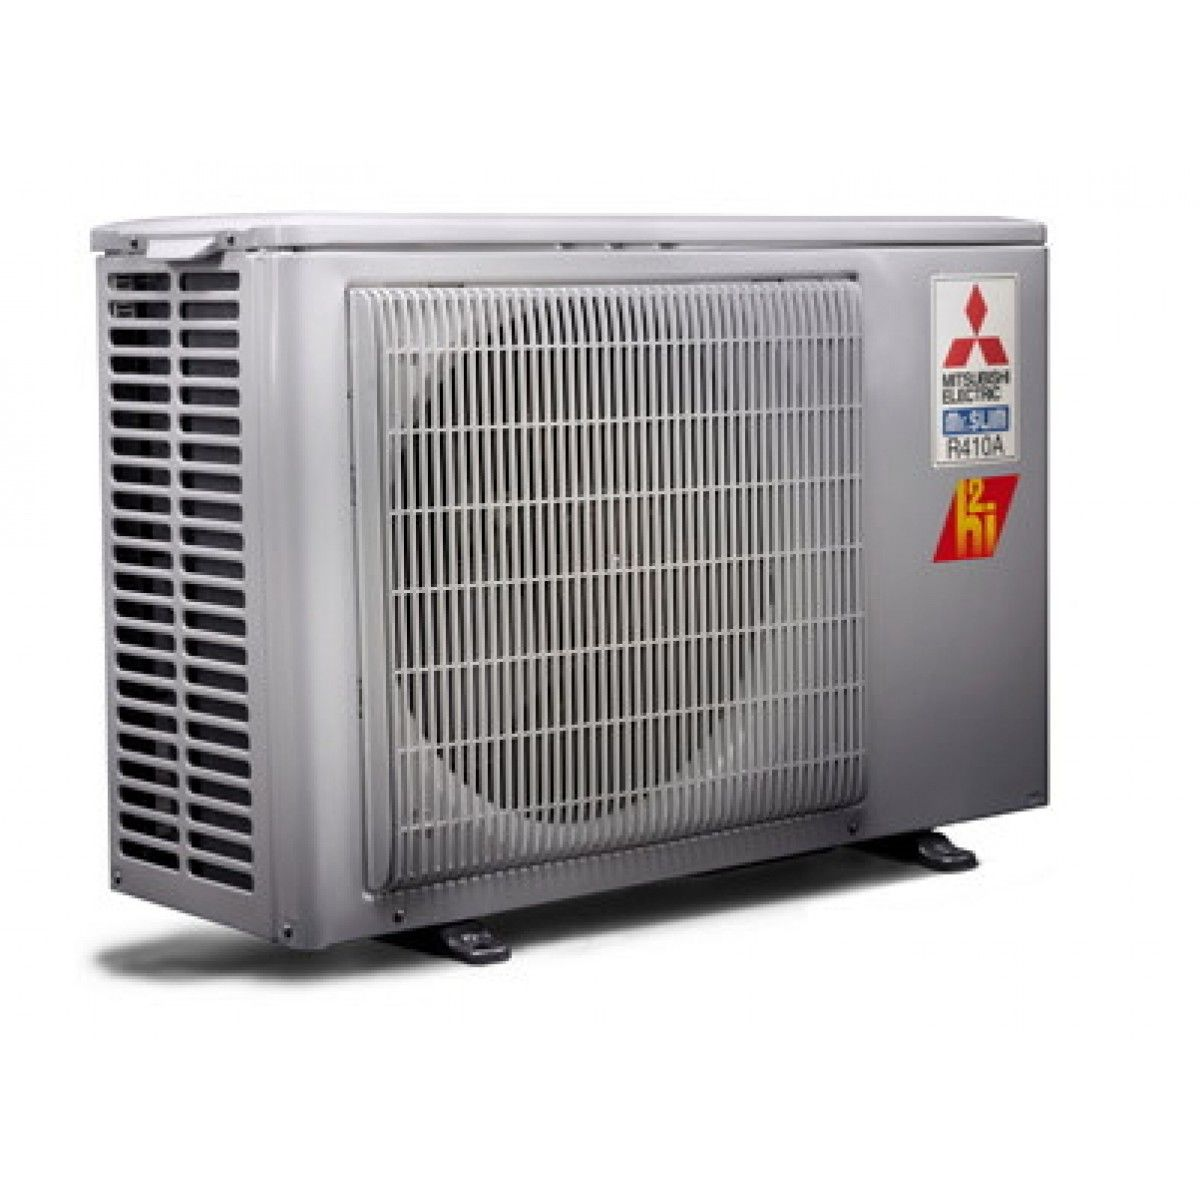 Heating And Cooling : Mitsubishi btu heat pump hyper seer system